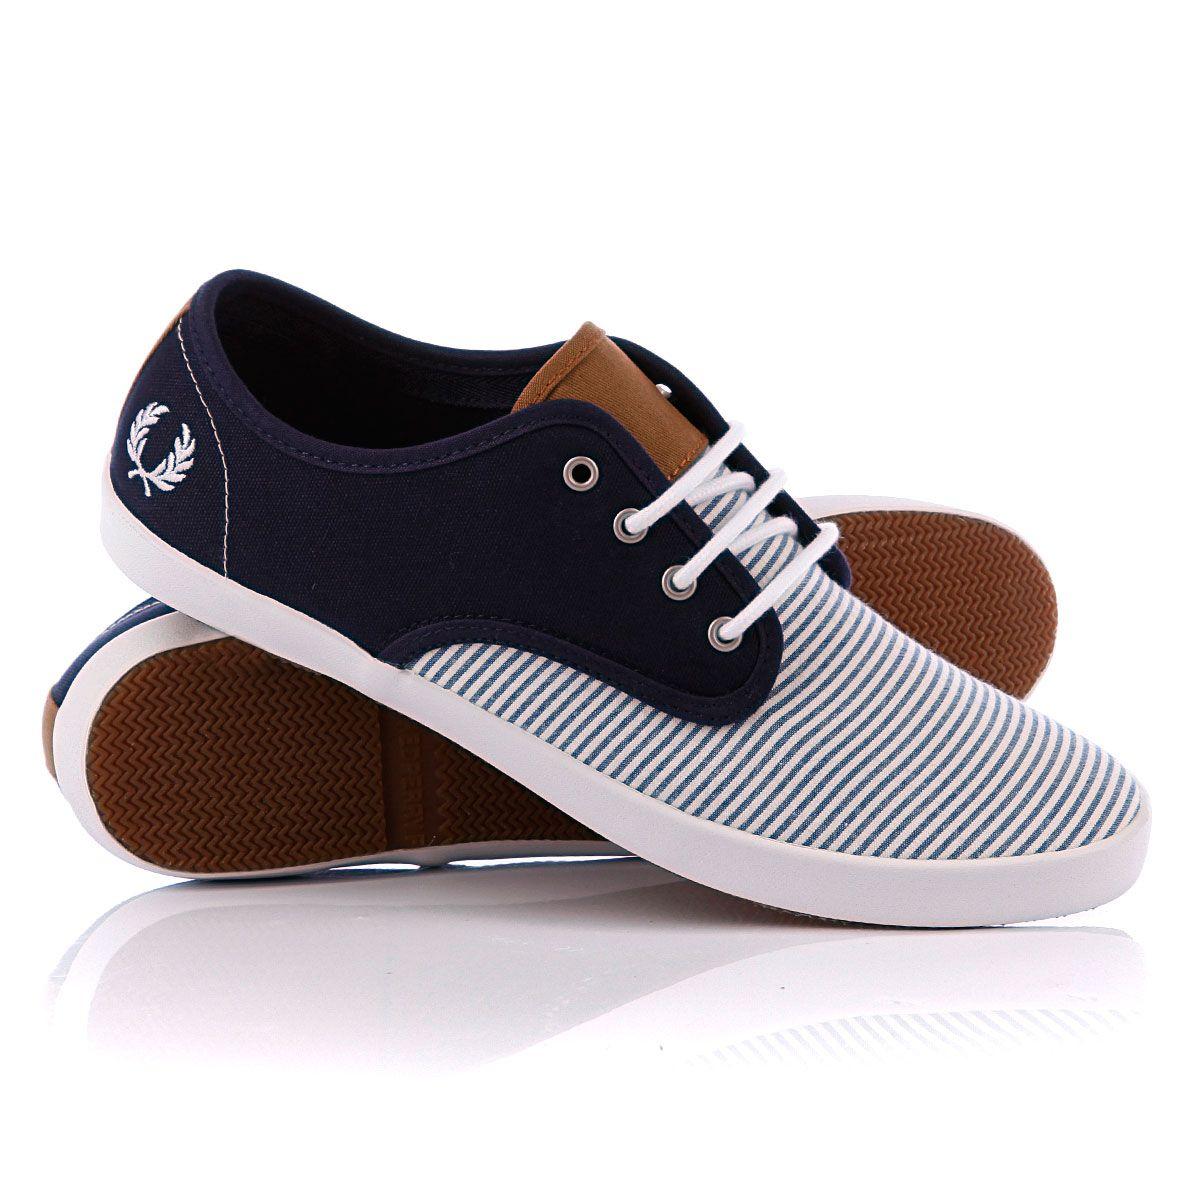 Кеды Fred Perry Foxx Seersucker Canvas Carbon Blue   Unique men's footwear   Shoes, Mens fashion ...